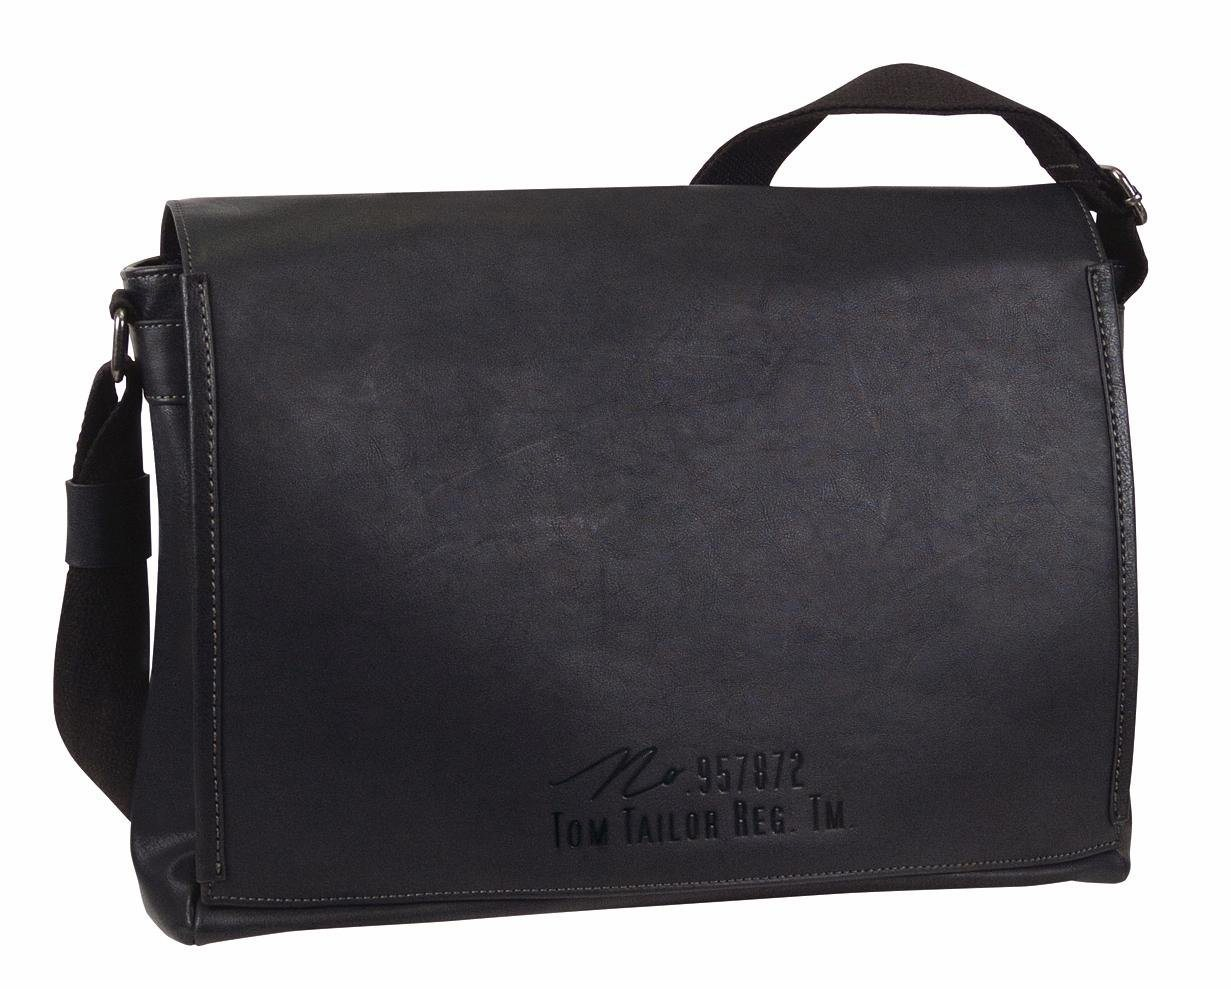 TOM TAILOR Messenger Bag »KENNY«, mit gepolstertem Laptopfach | Taschen > Business Taschen > Messenger Bags | Schwarz | TOM TAILOR